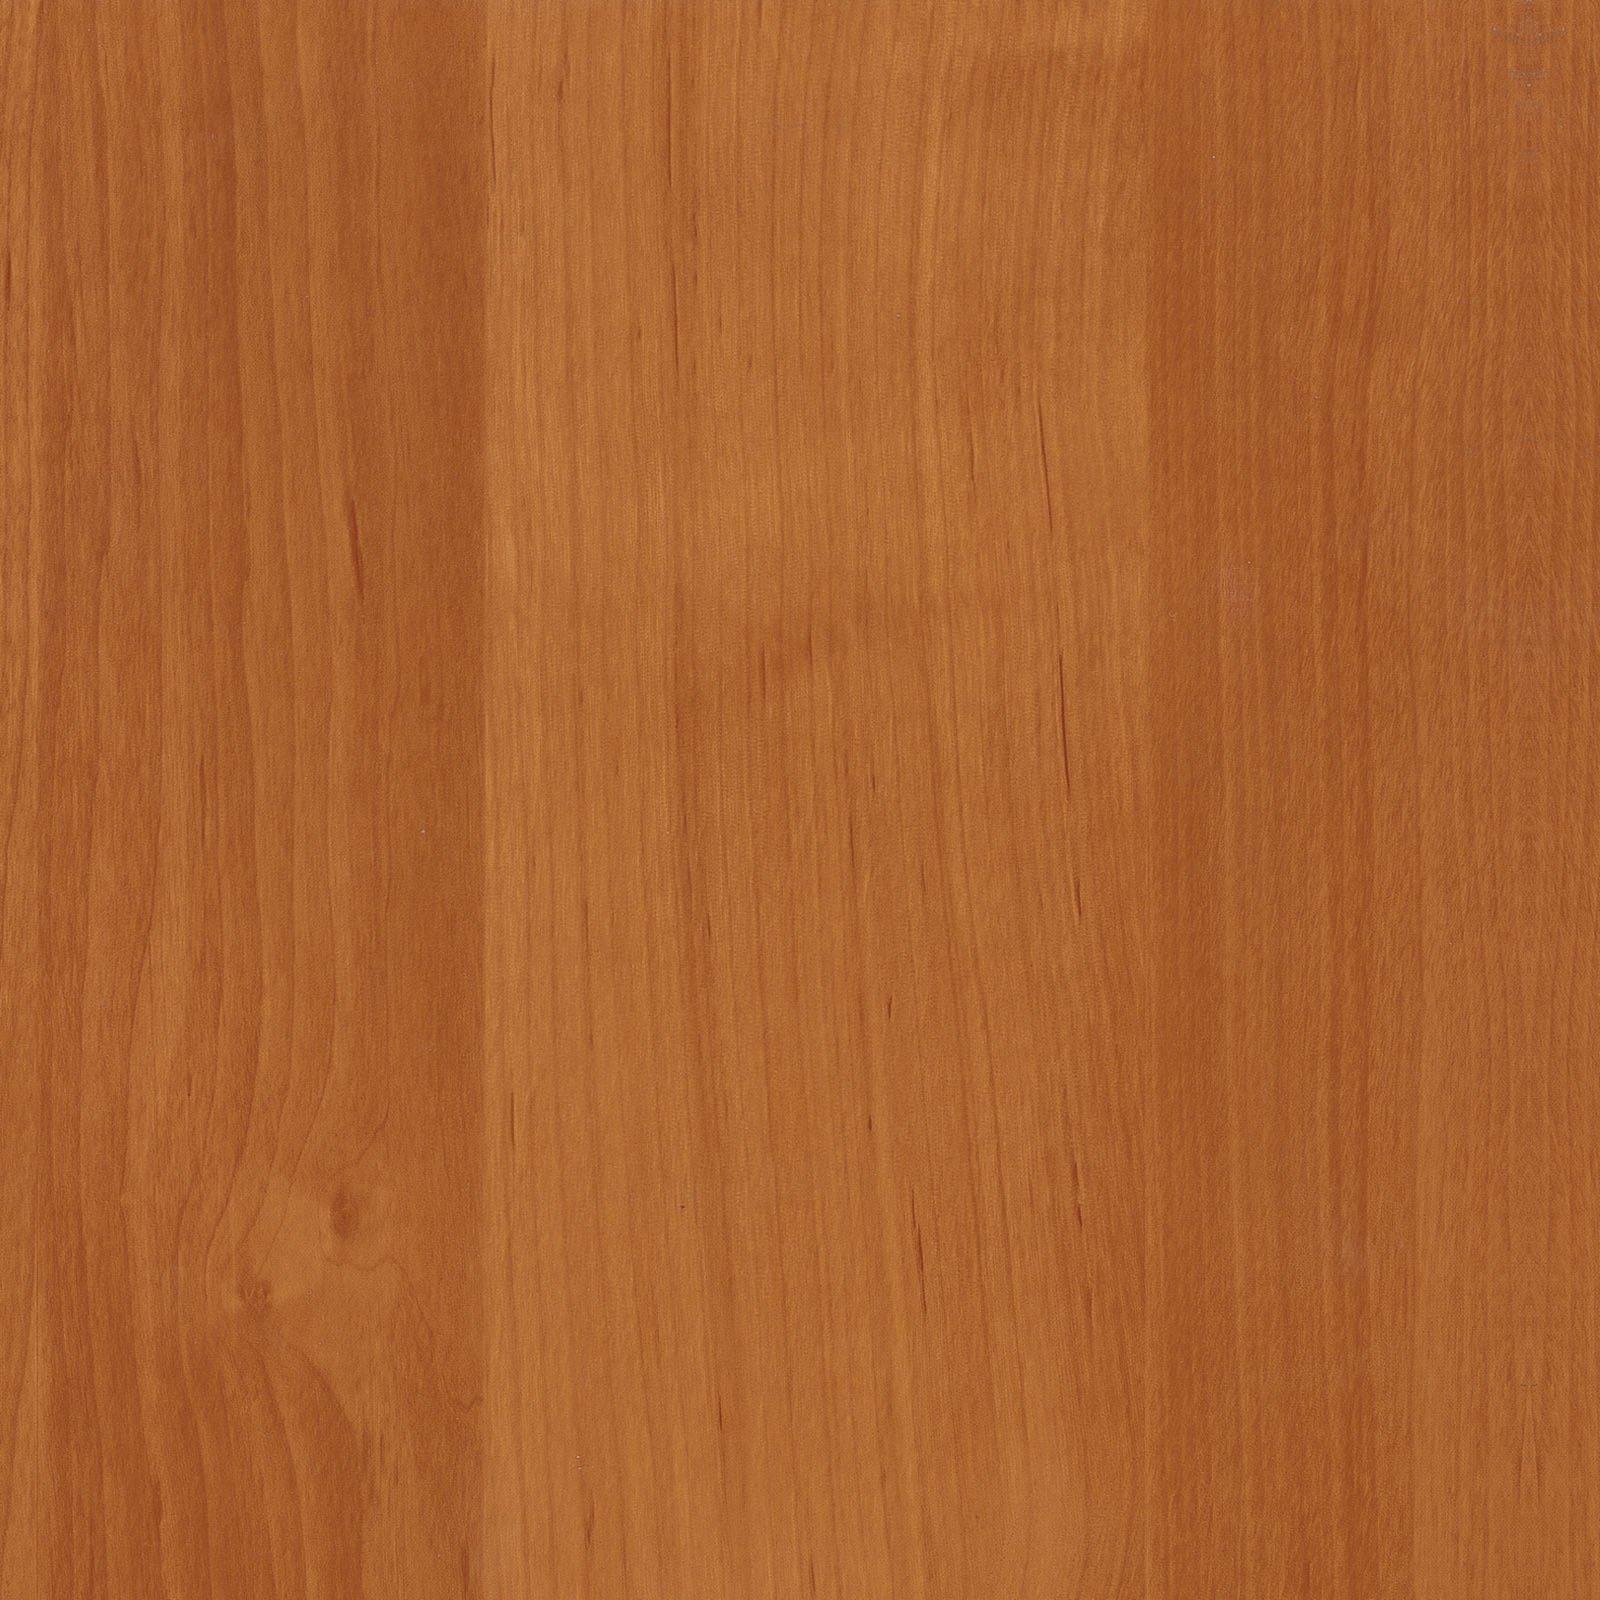 d-c fix Möbelfolie - Erle - 67,5x200 cm